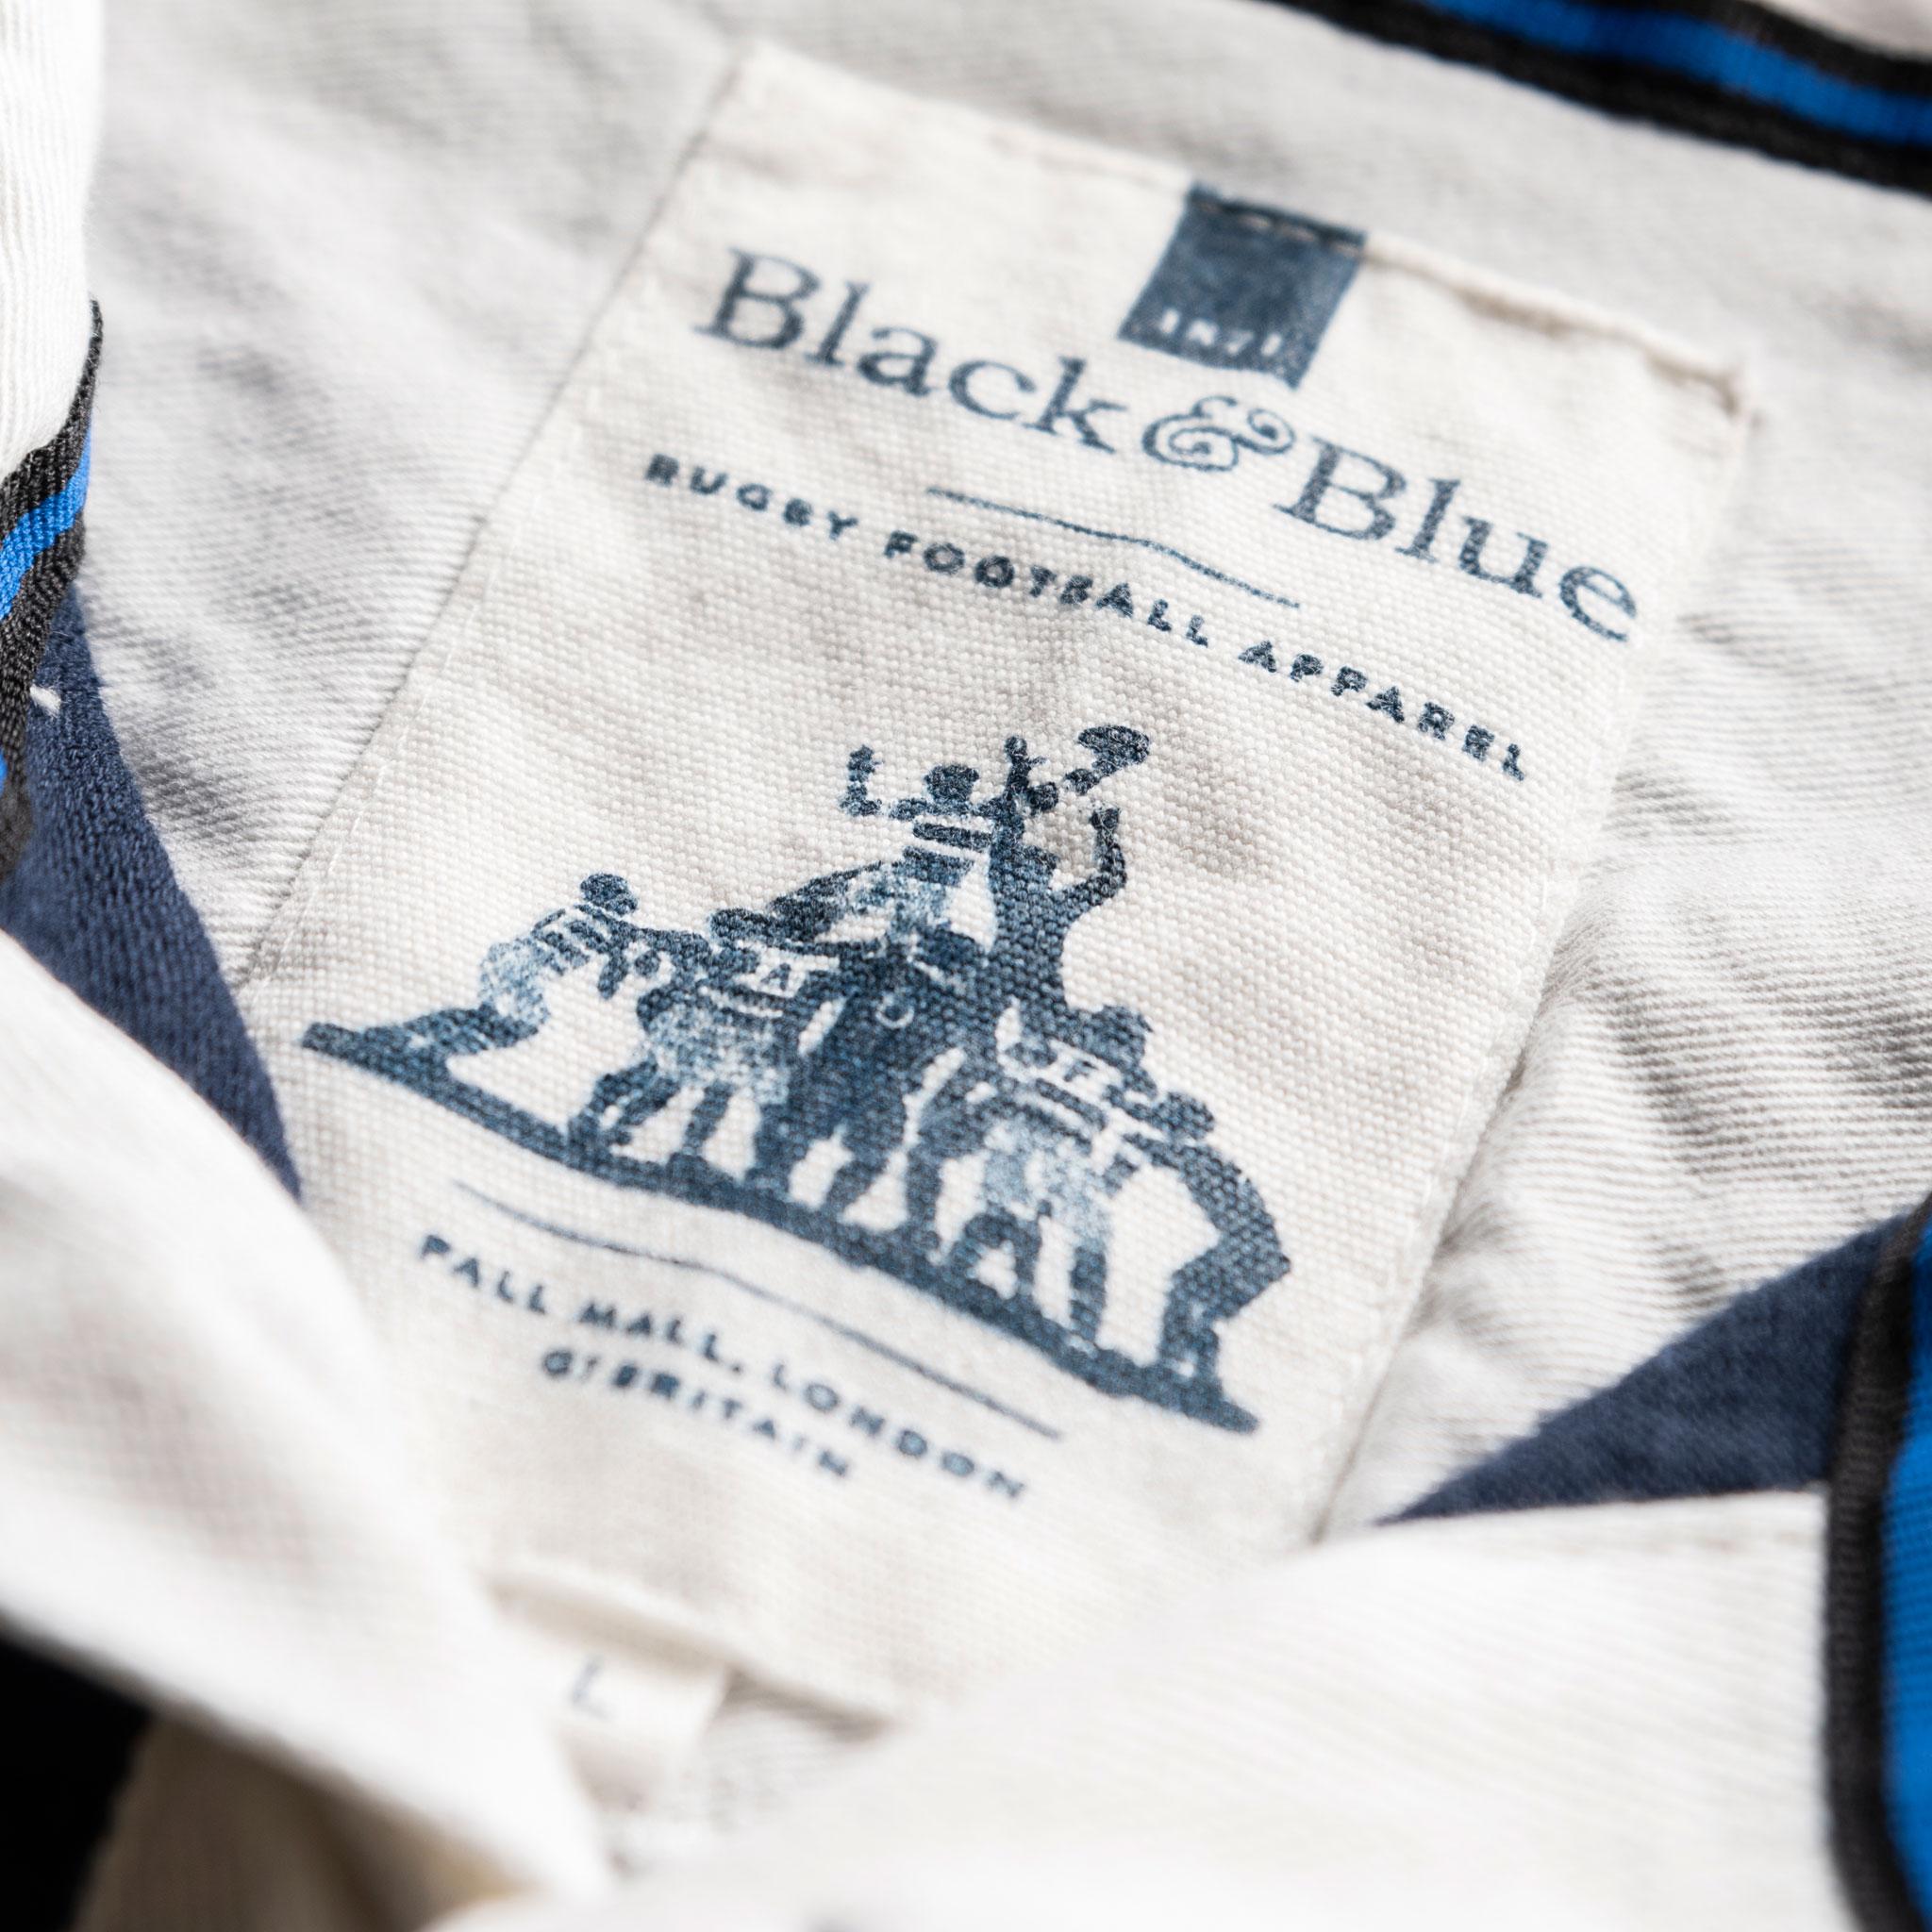 Scotland 1871 Vintage Rugby Shirt_BB Label